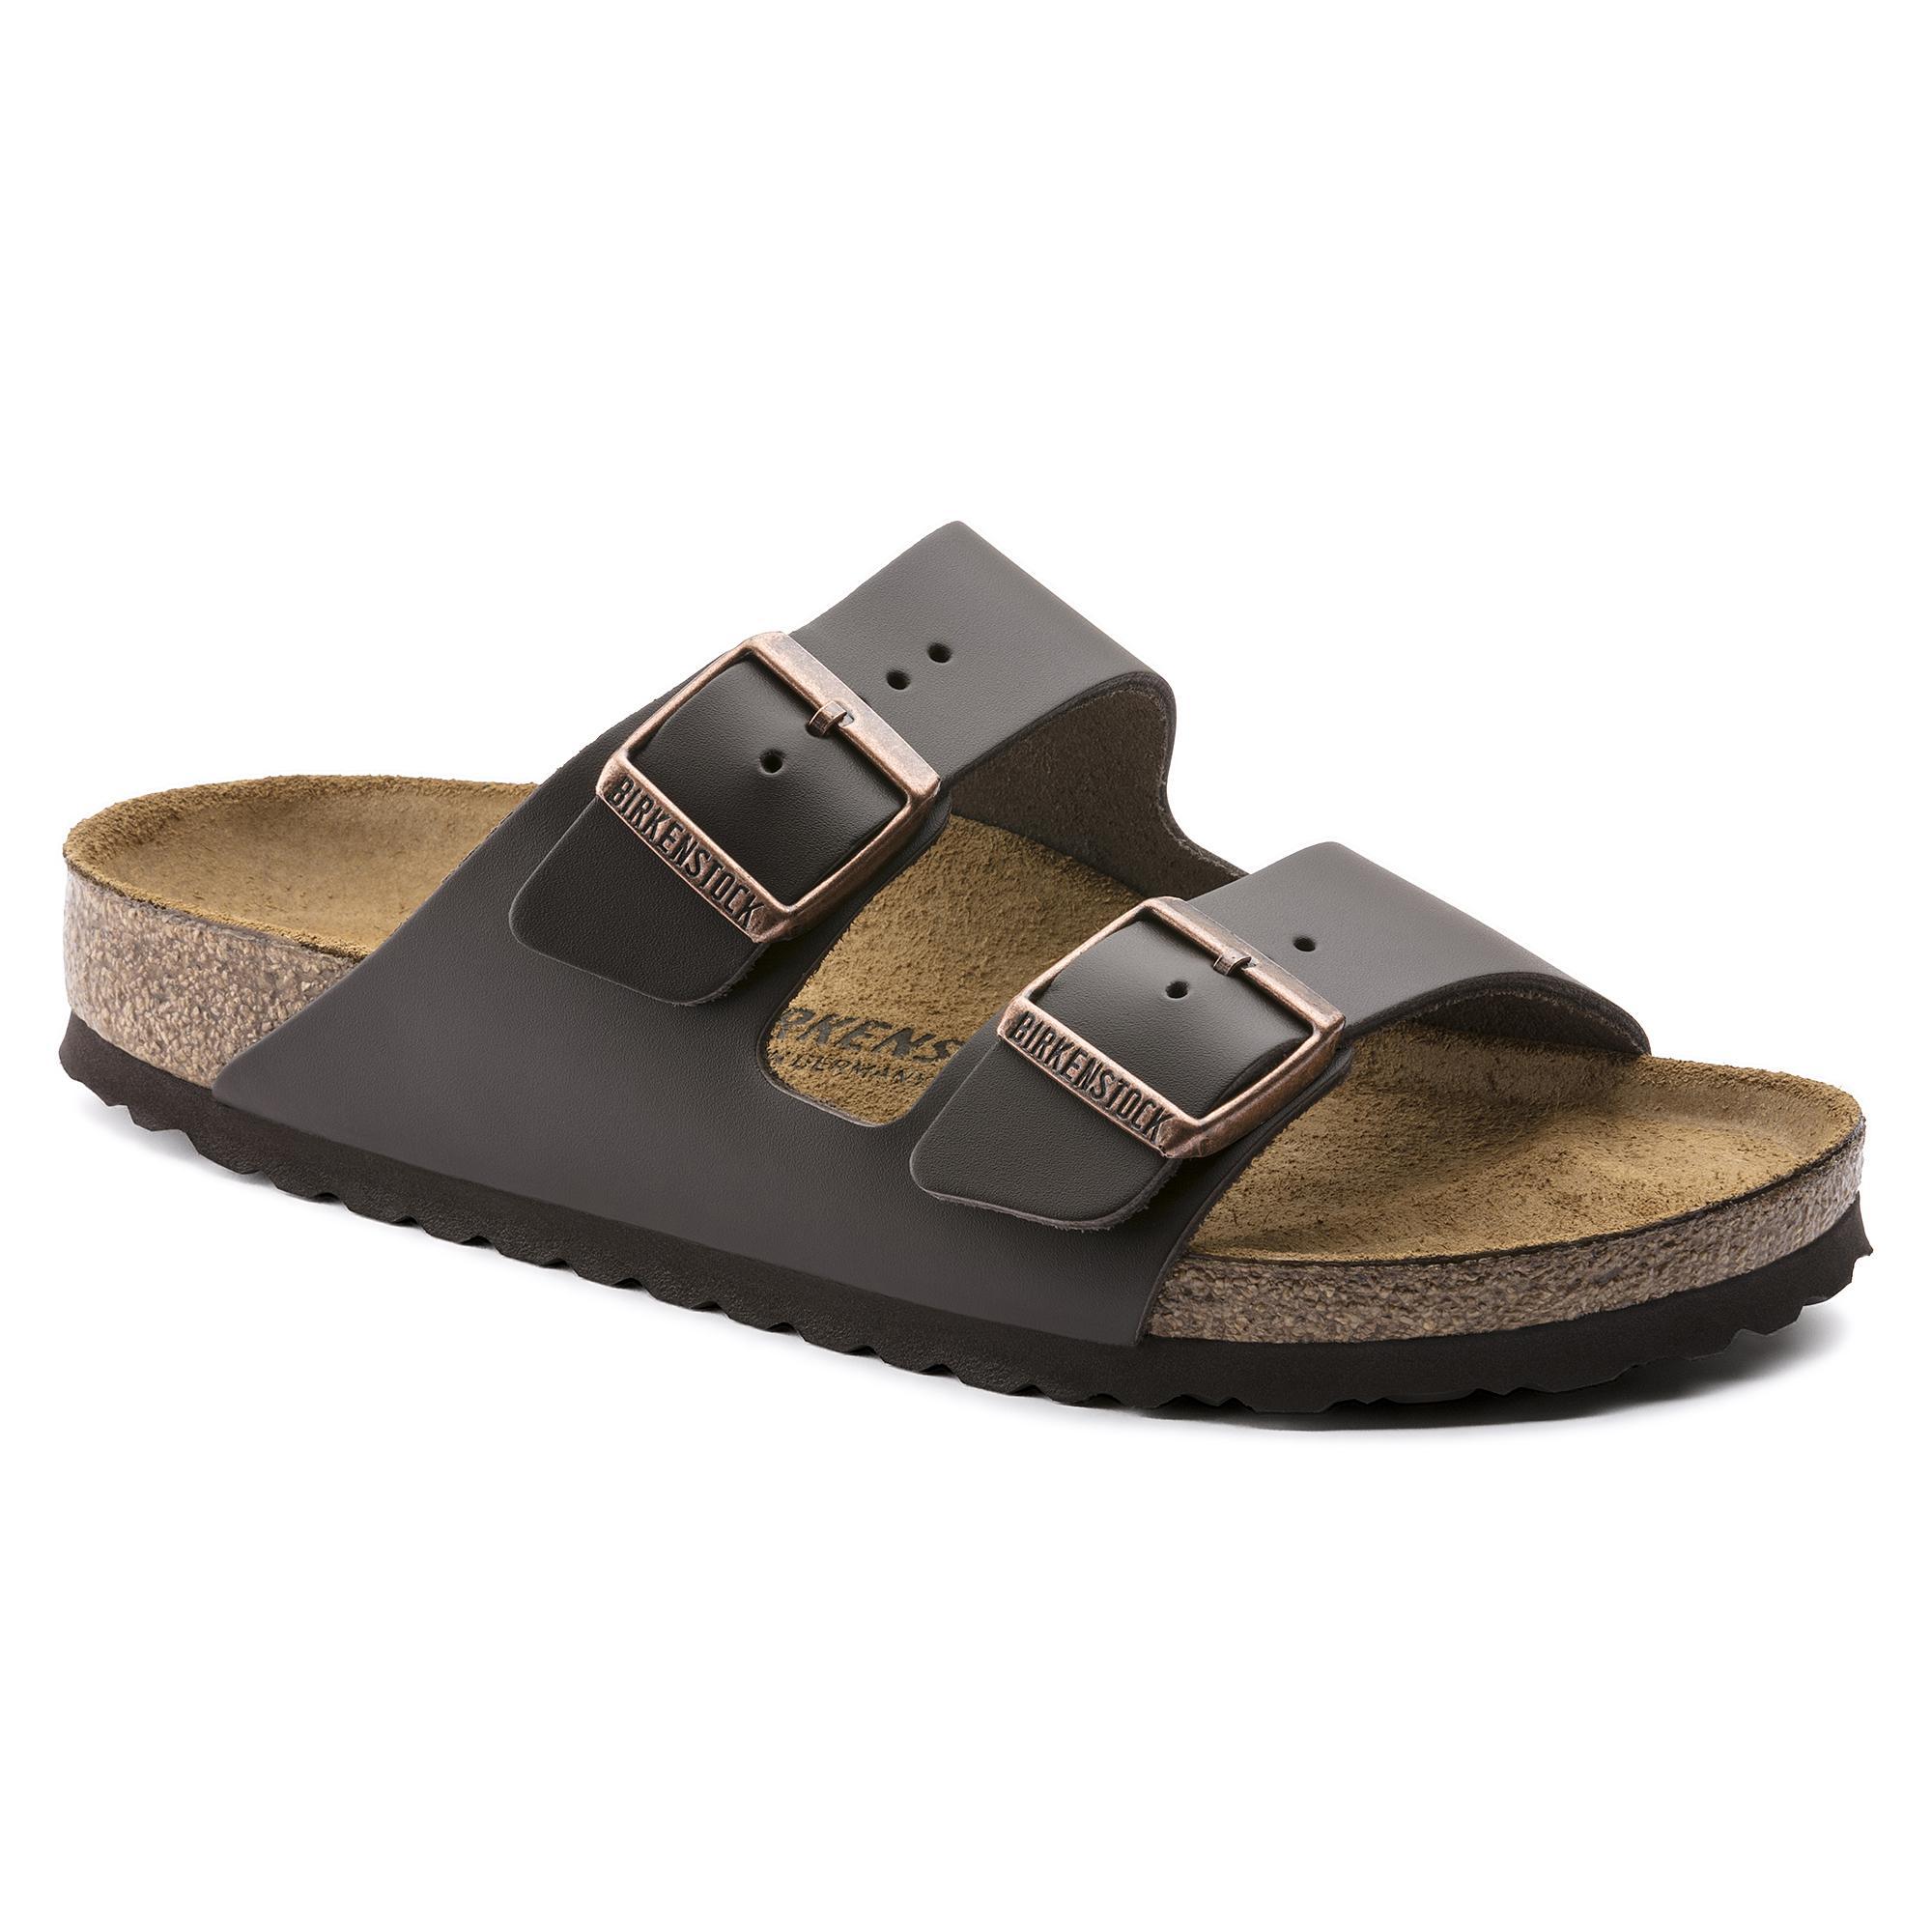 a083aa5ae Slides for Men for sale - Slide Slippers for Men online brands ...